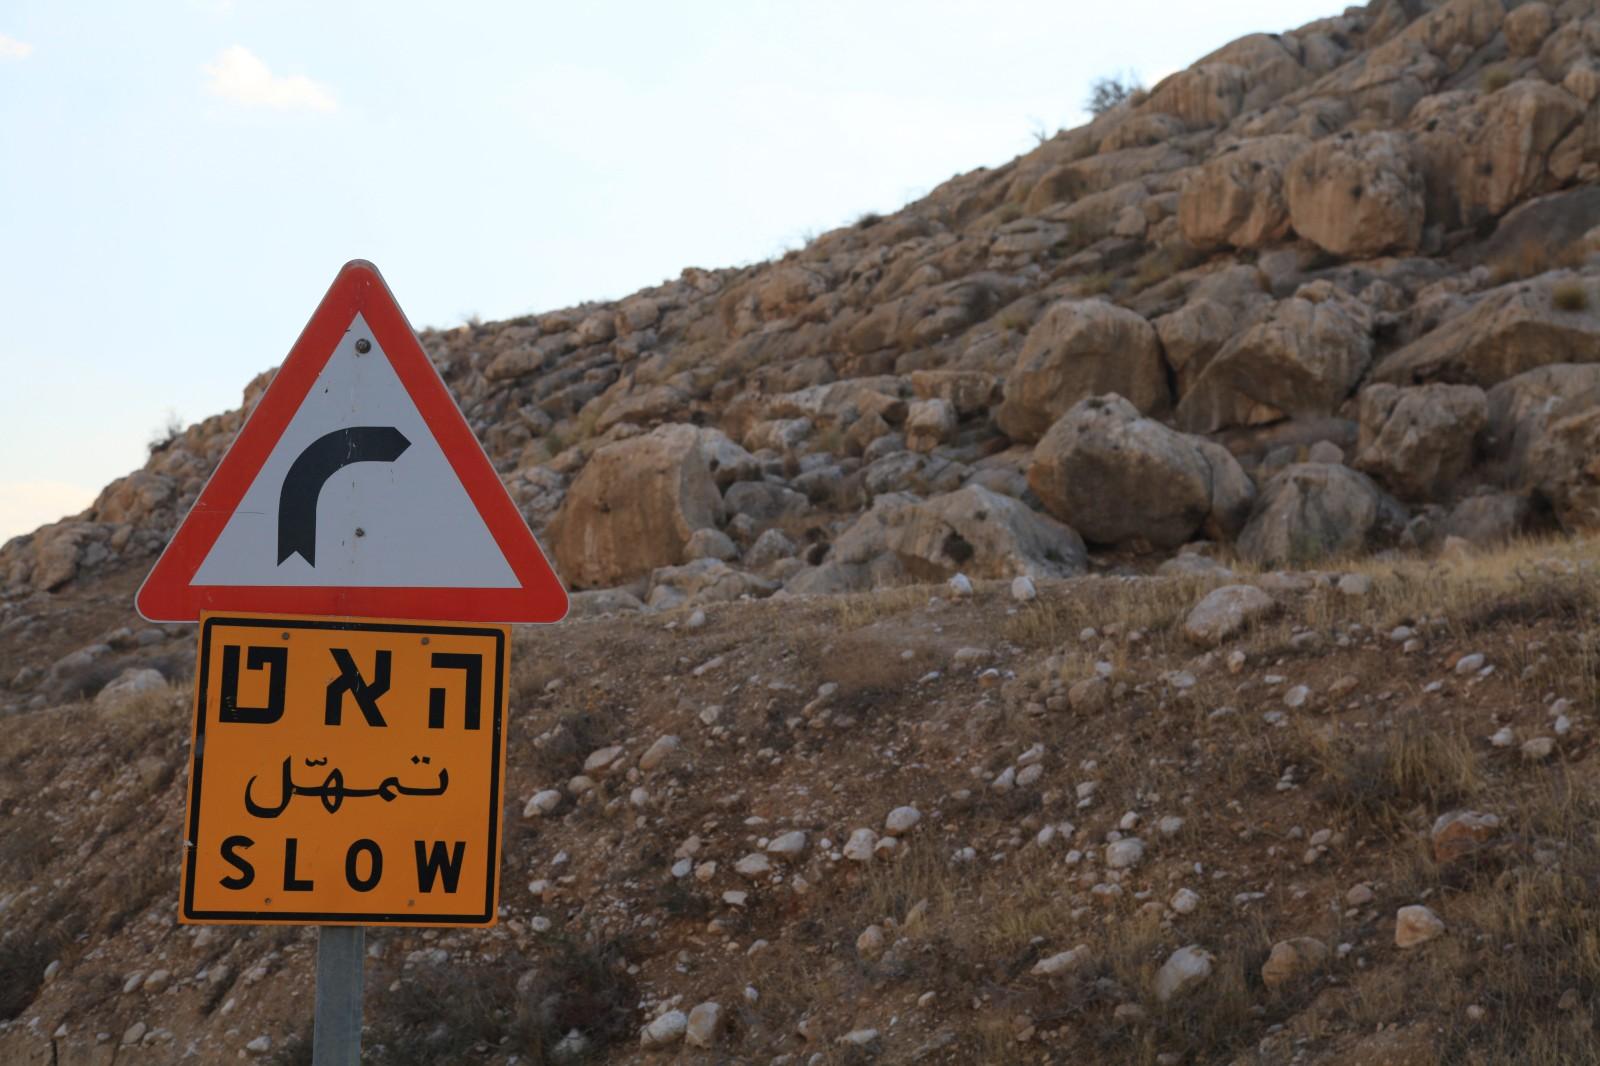 Trilingual sign